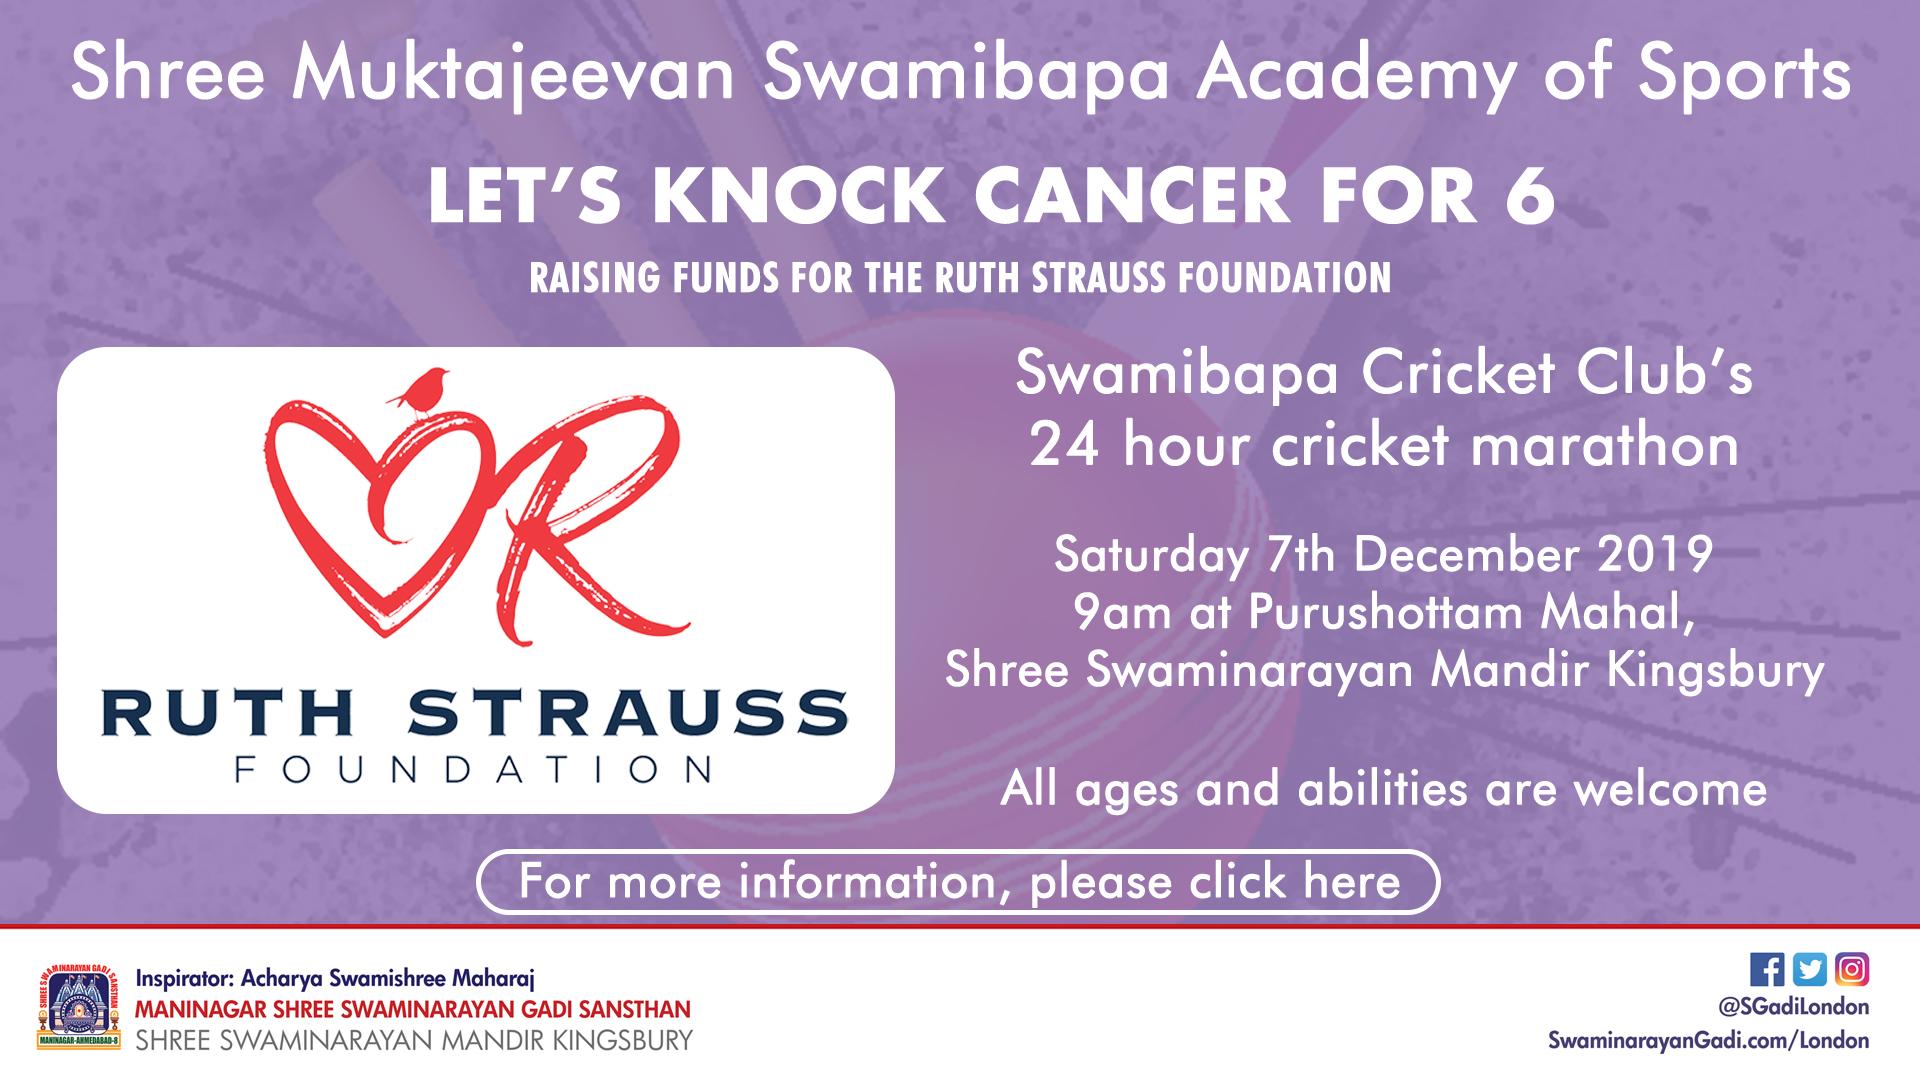 Swamibapa Cricket Club 24 hour Cricket Marathon - Lets Knock Cancer for 6